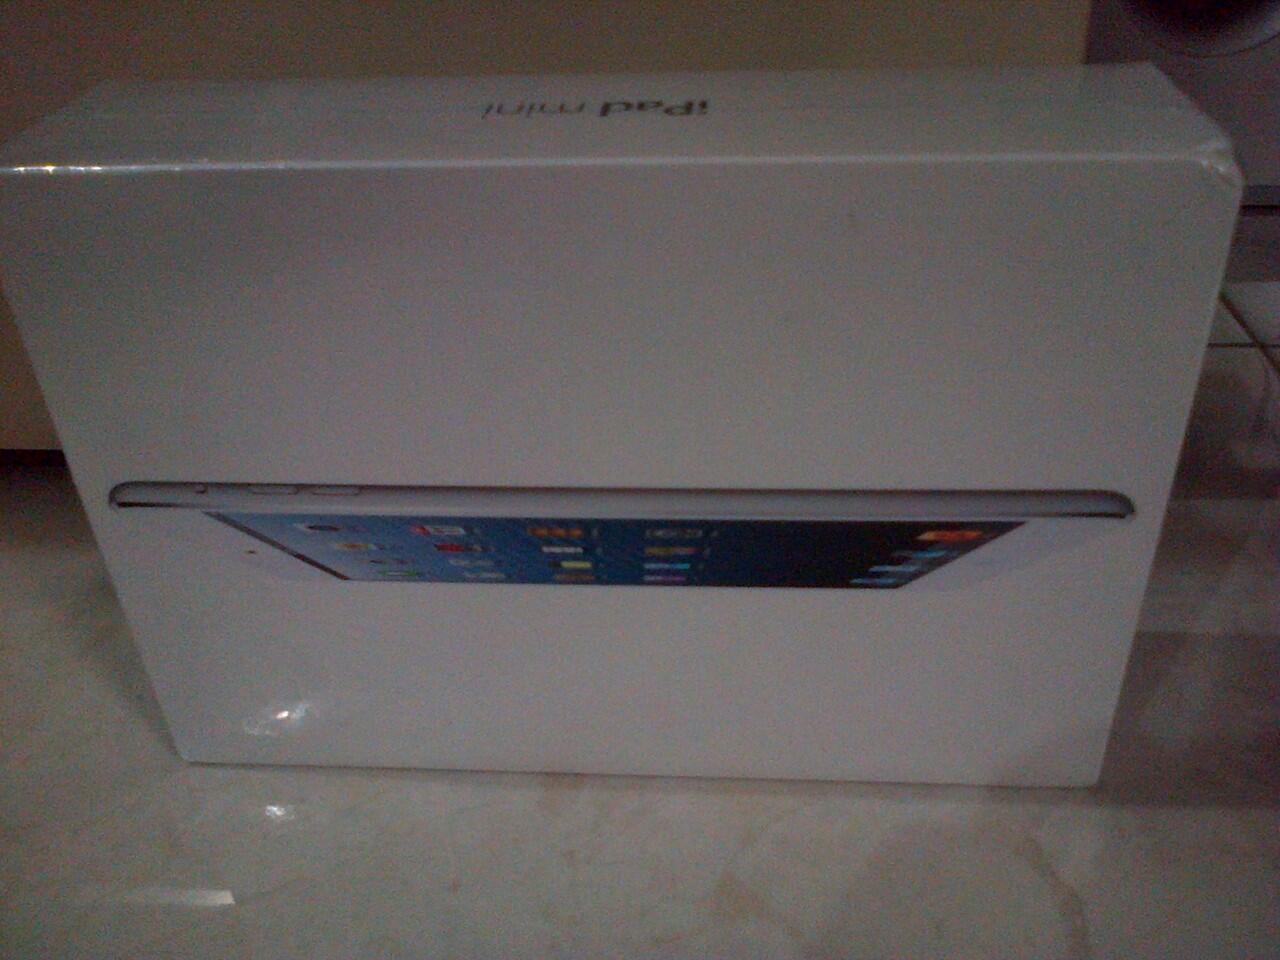 IPAD MINI WIFI + Cellular 16GB White BNIB